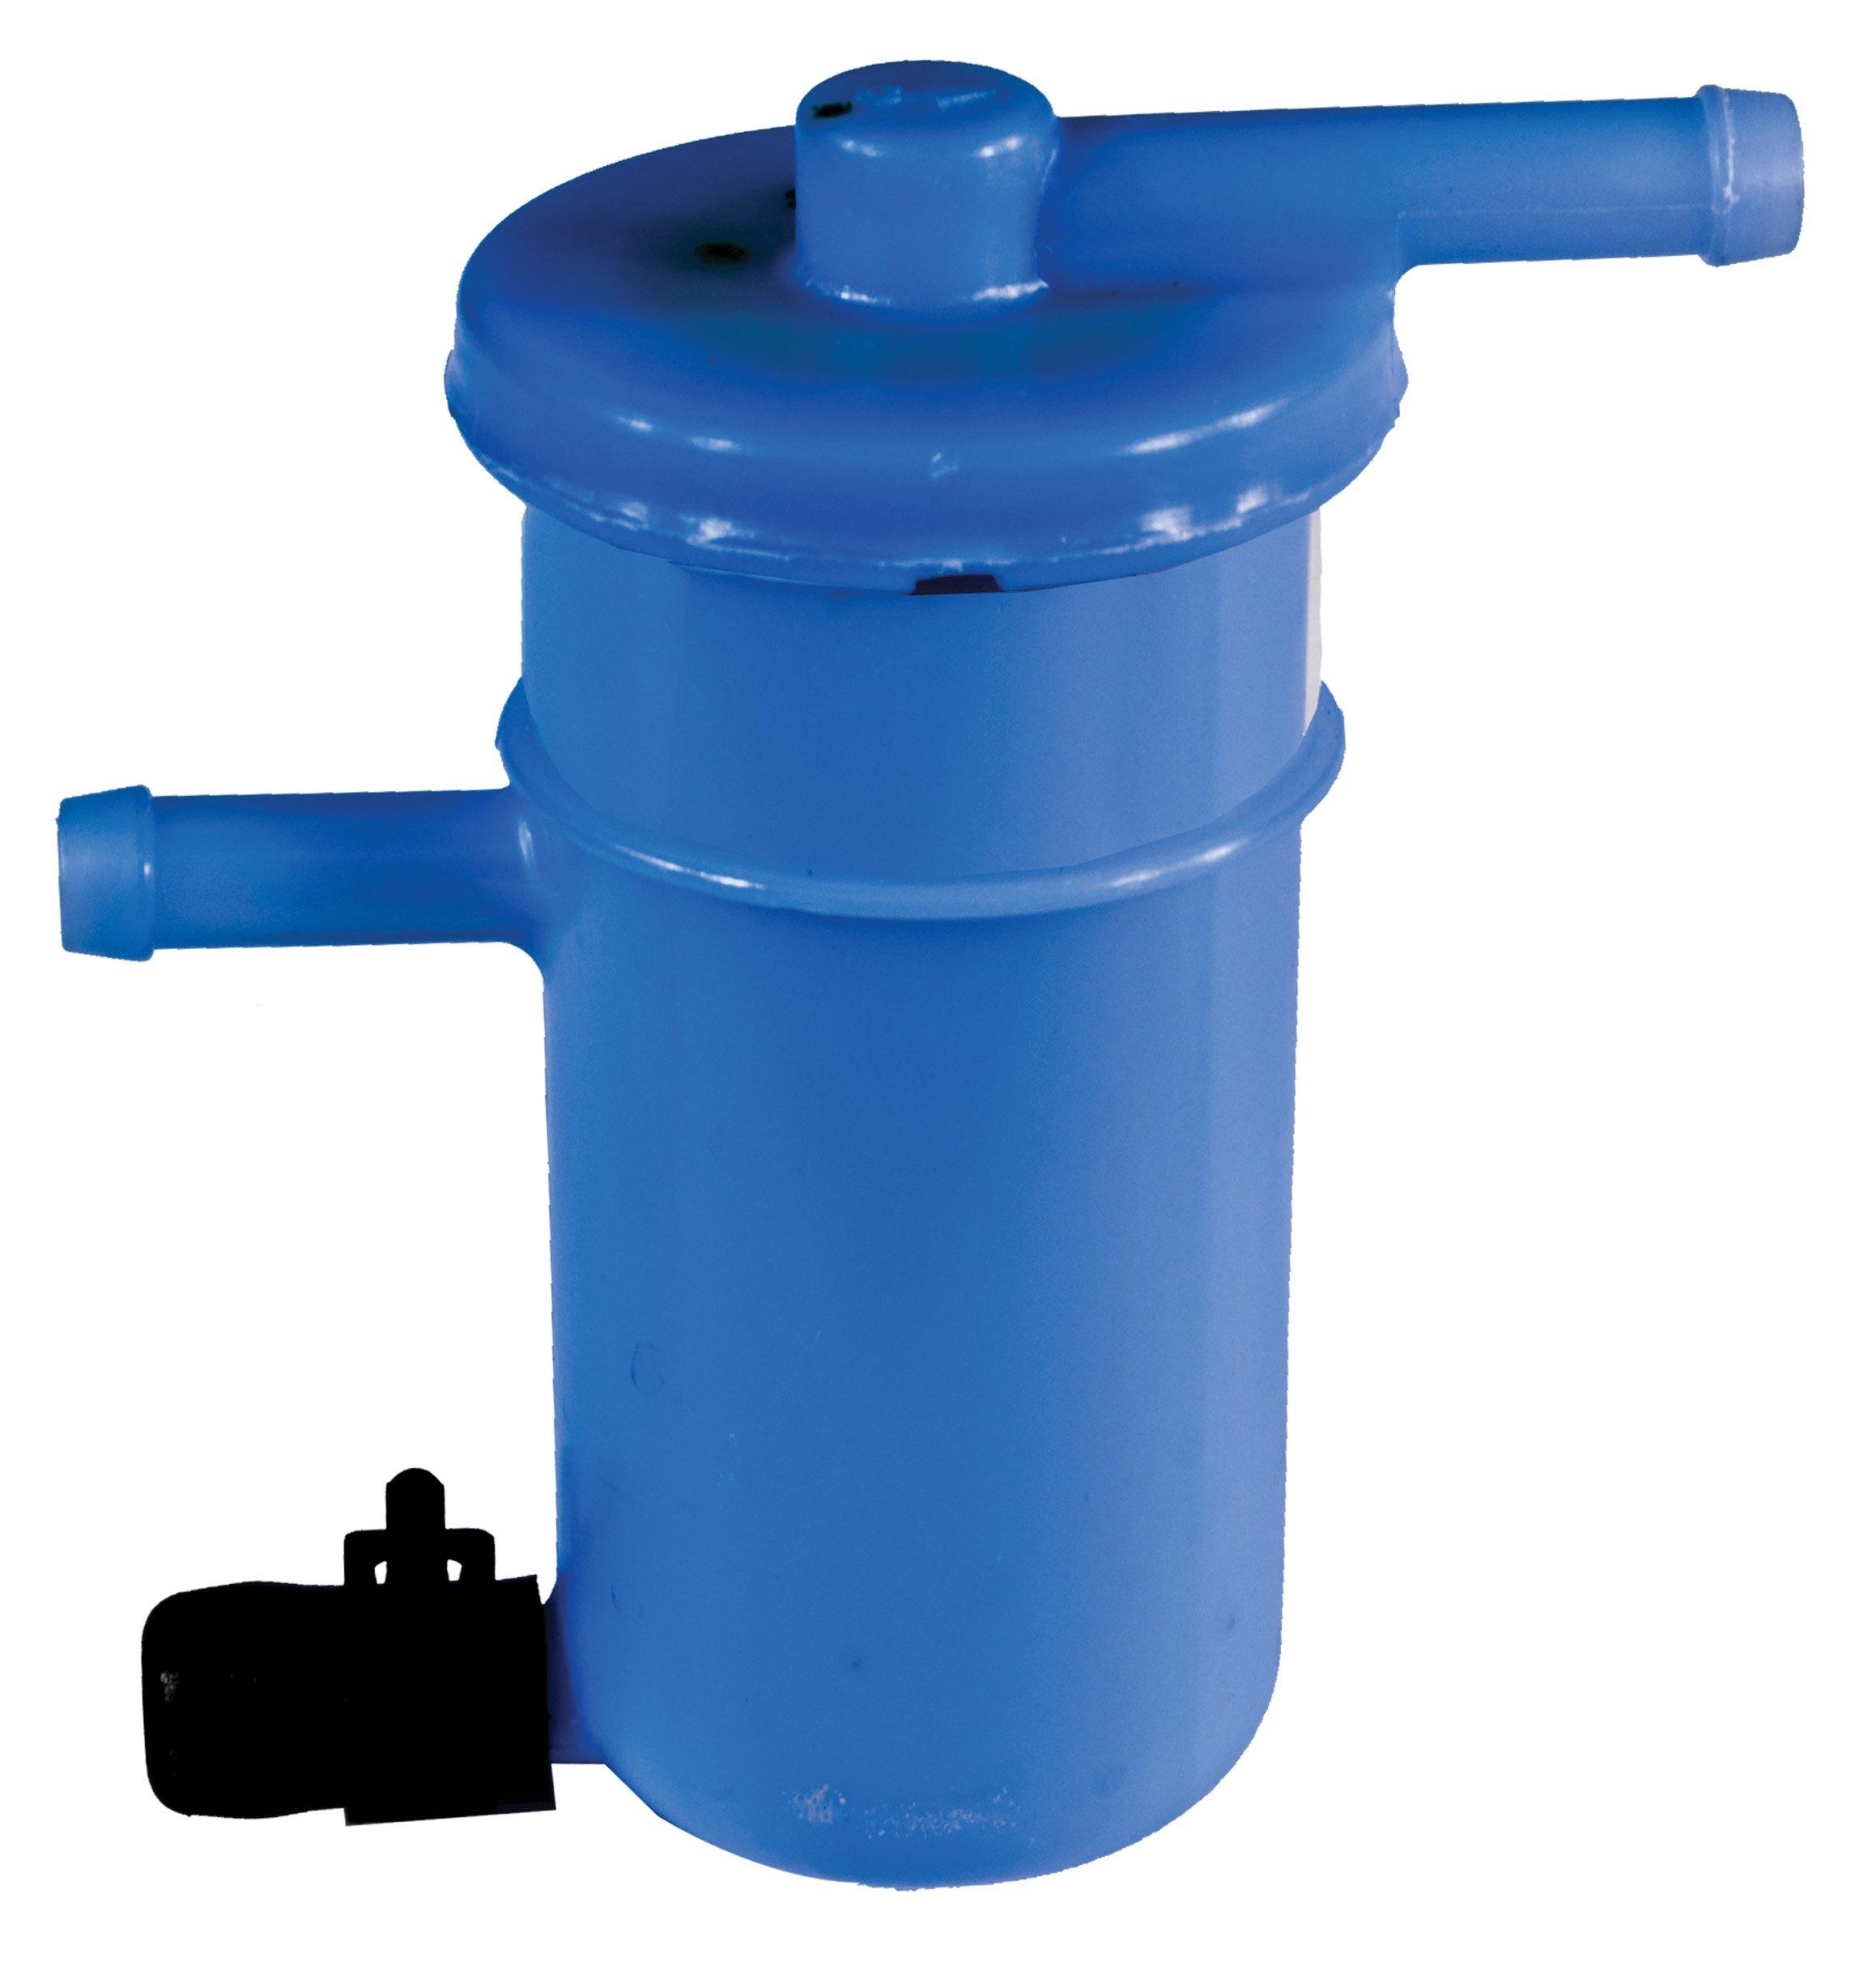 Amazon.com: Sierra International 18-7711 Inline Marine Fuel Filter for  Suzuki Outboard Motor: Automotive